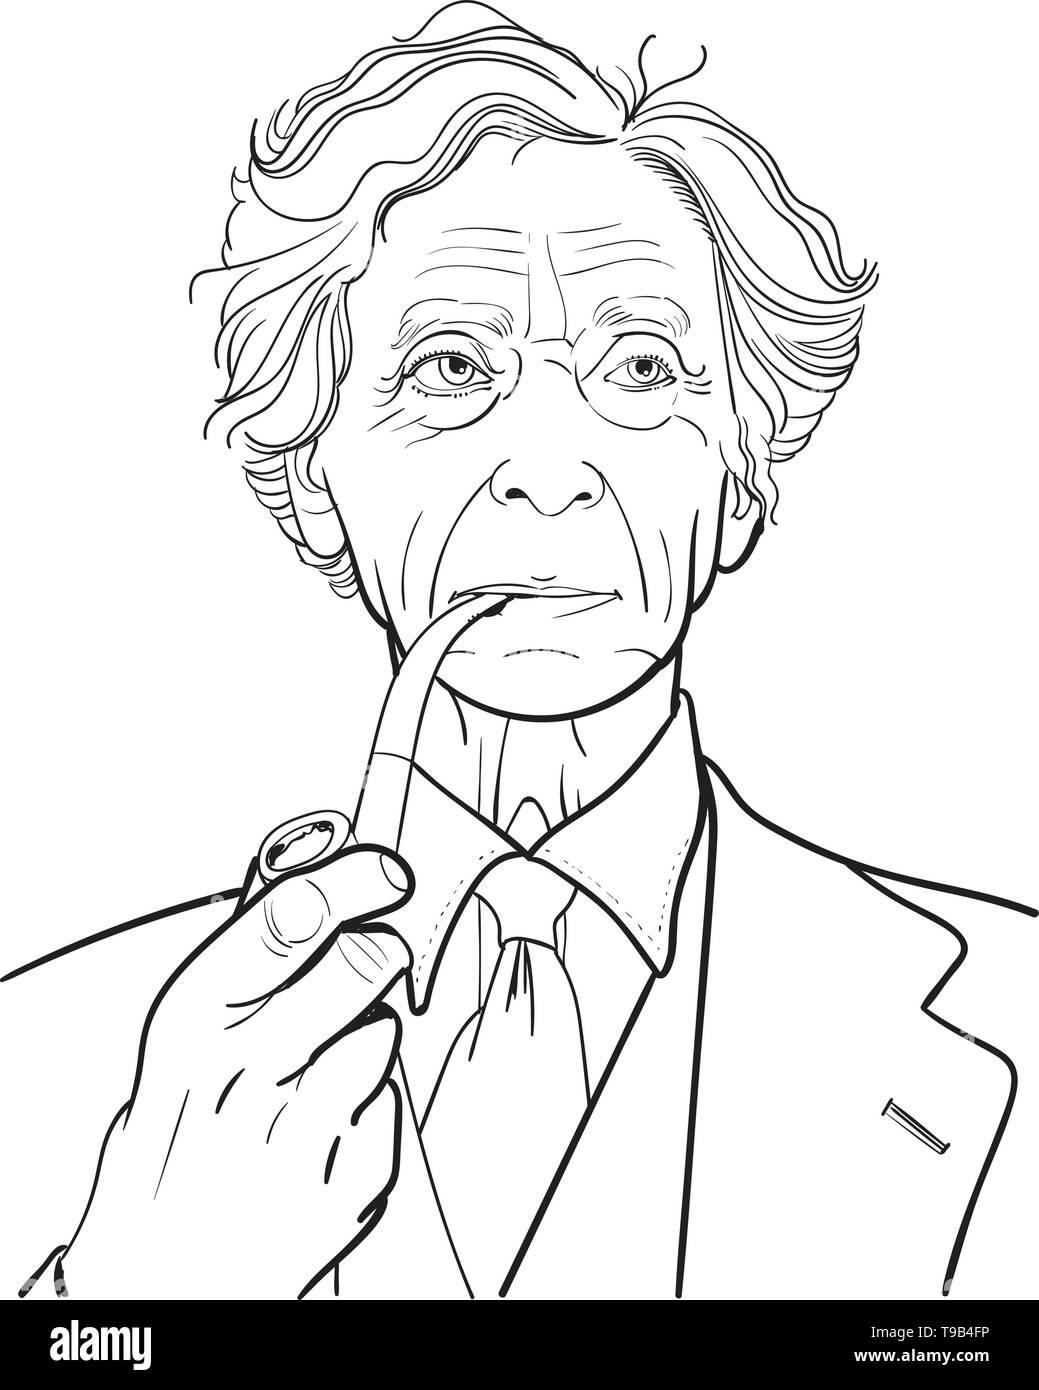 Bertrand Arthur William Russell, was a British philosopher, logician, mathematician, historian, writer, essayist, social critic, political activist, a - Stock Image